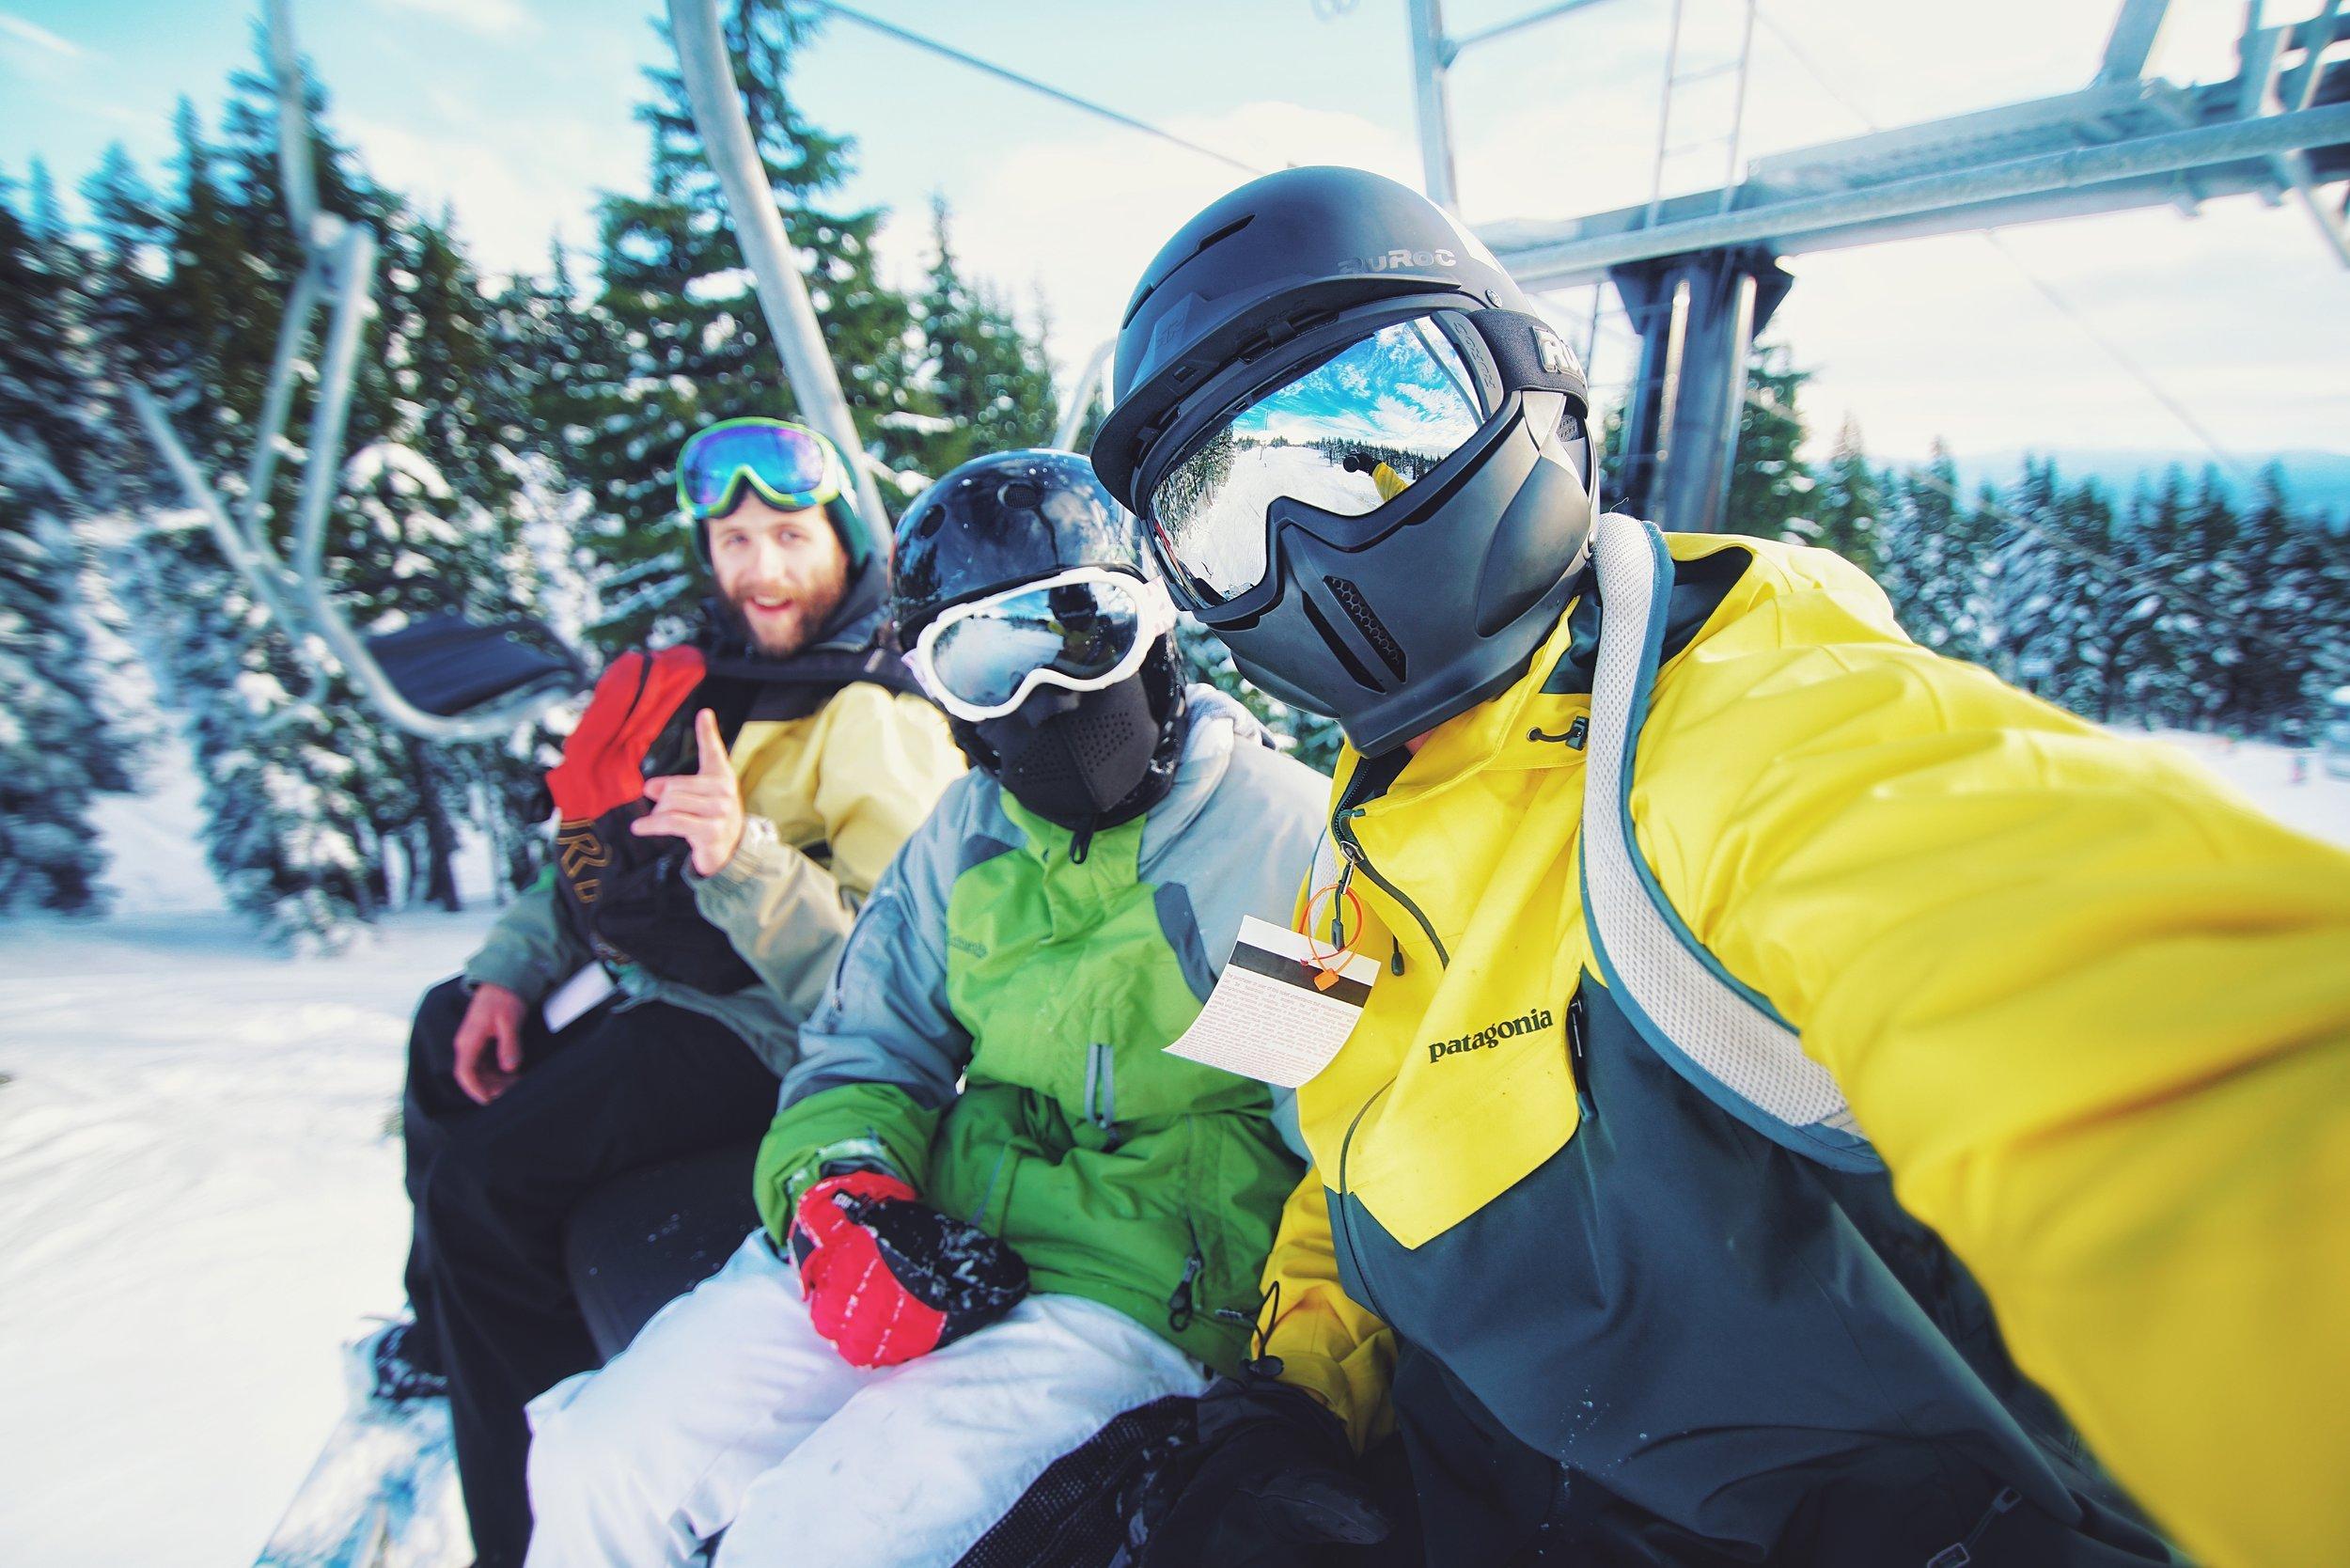 Cruising up on the ski lift between runs with Sarah and Daniel.